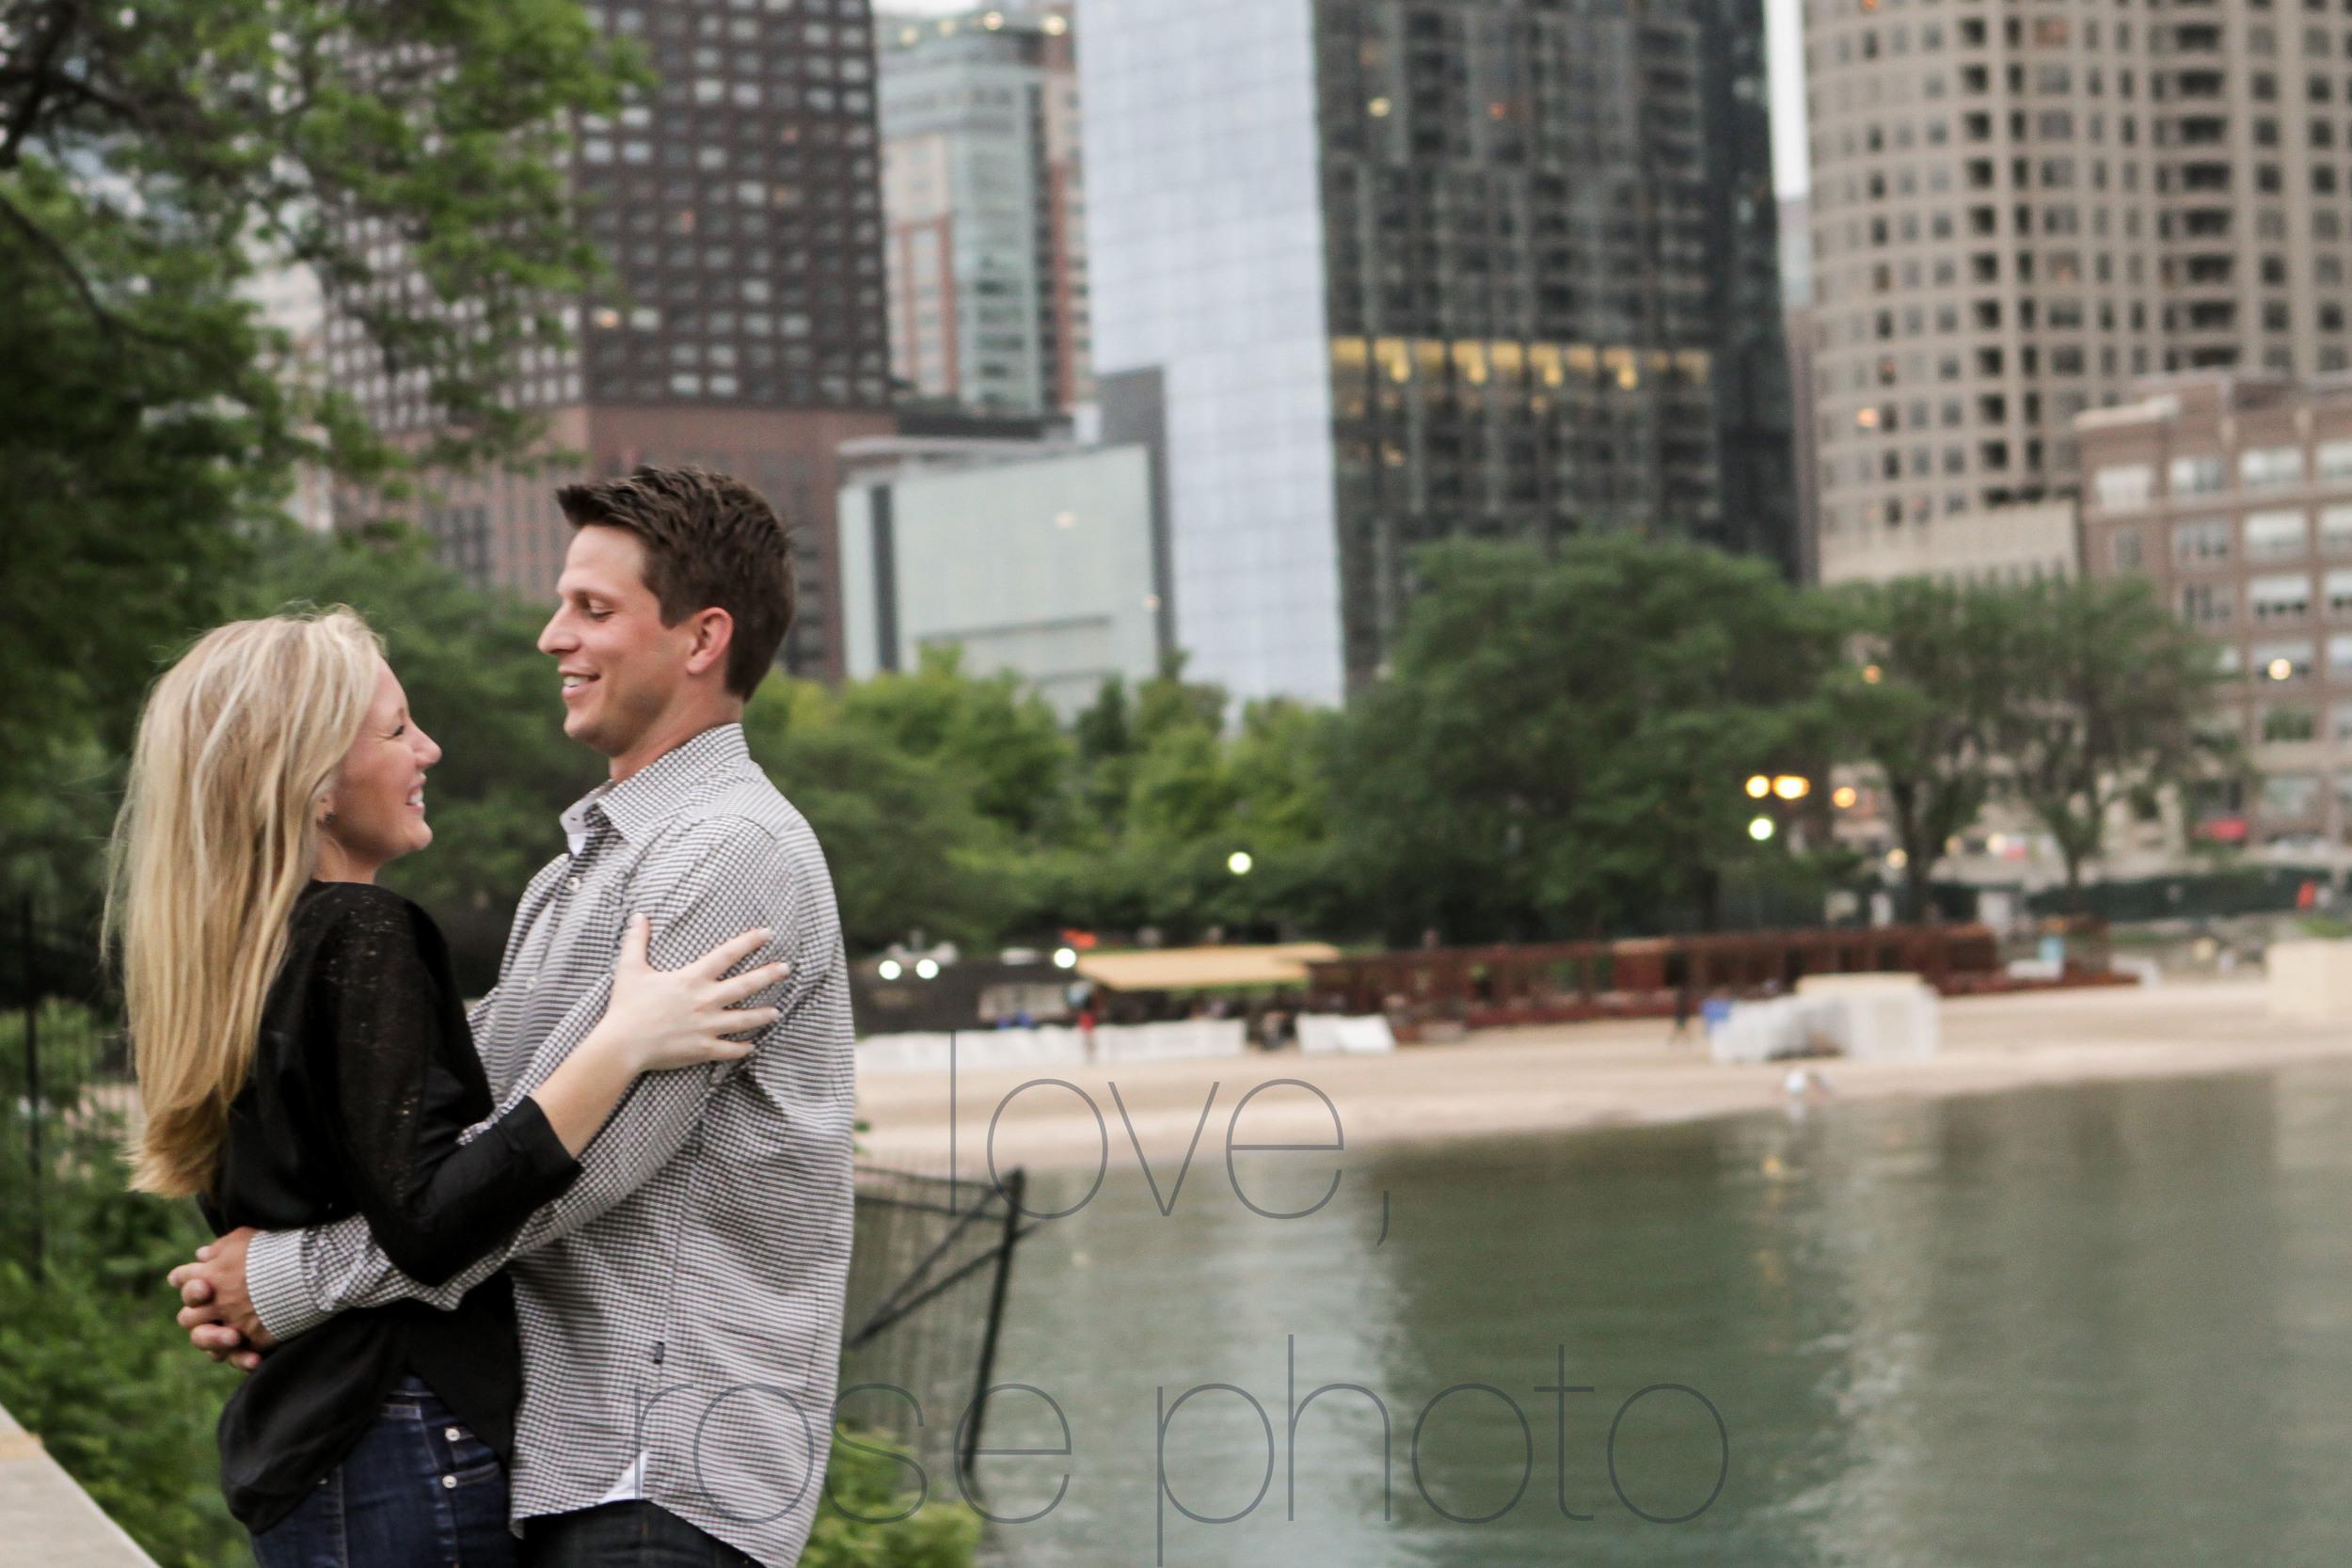 chicago yacht club lake front engagement shoot olive park chicago theater wedding photographer rose photo-007.jpg